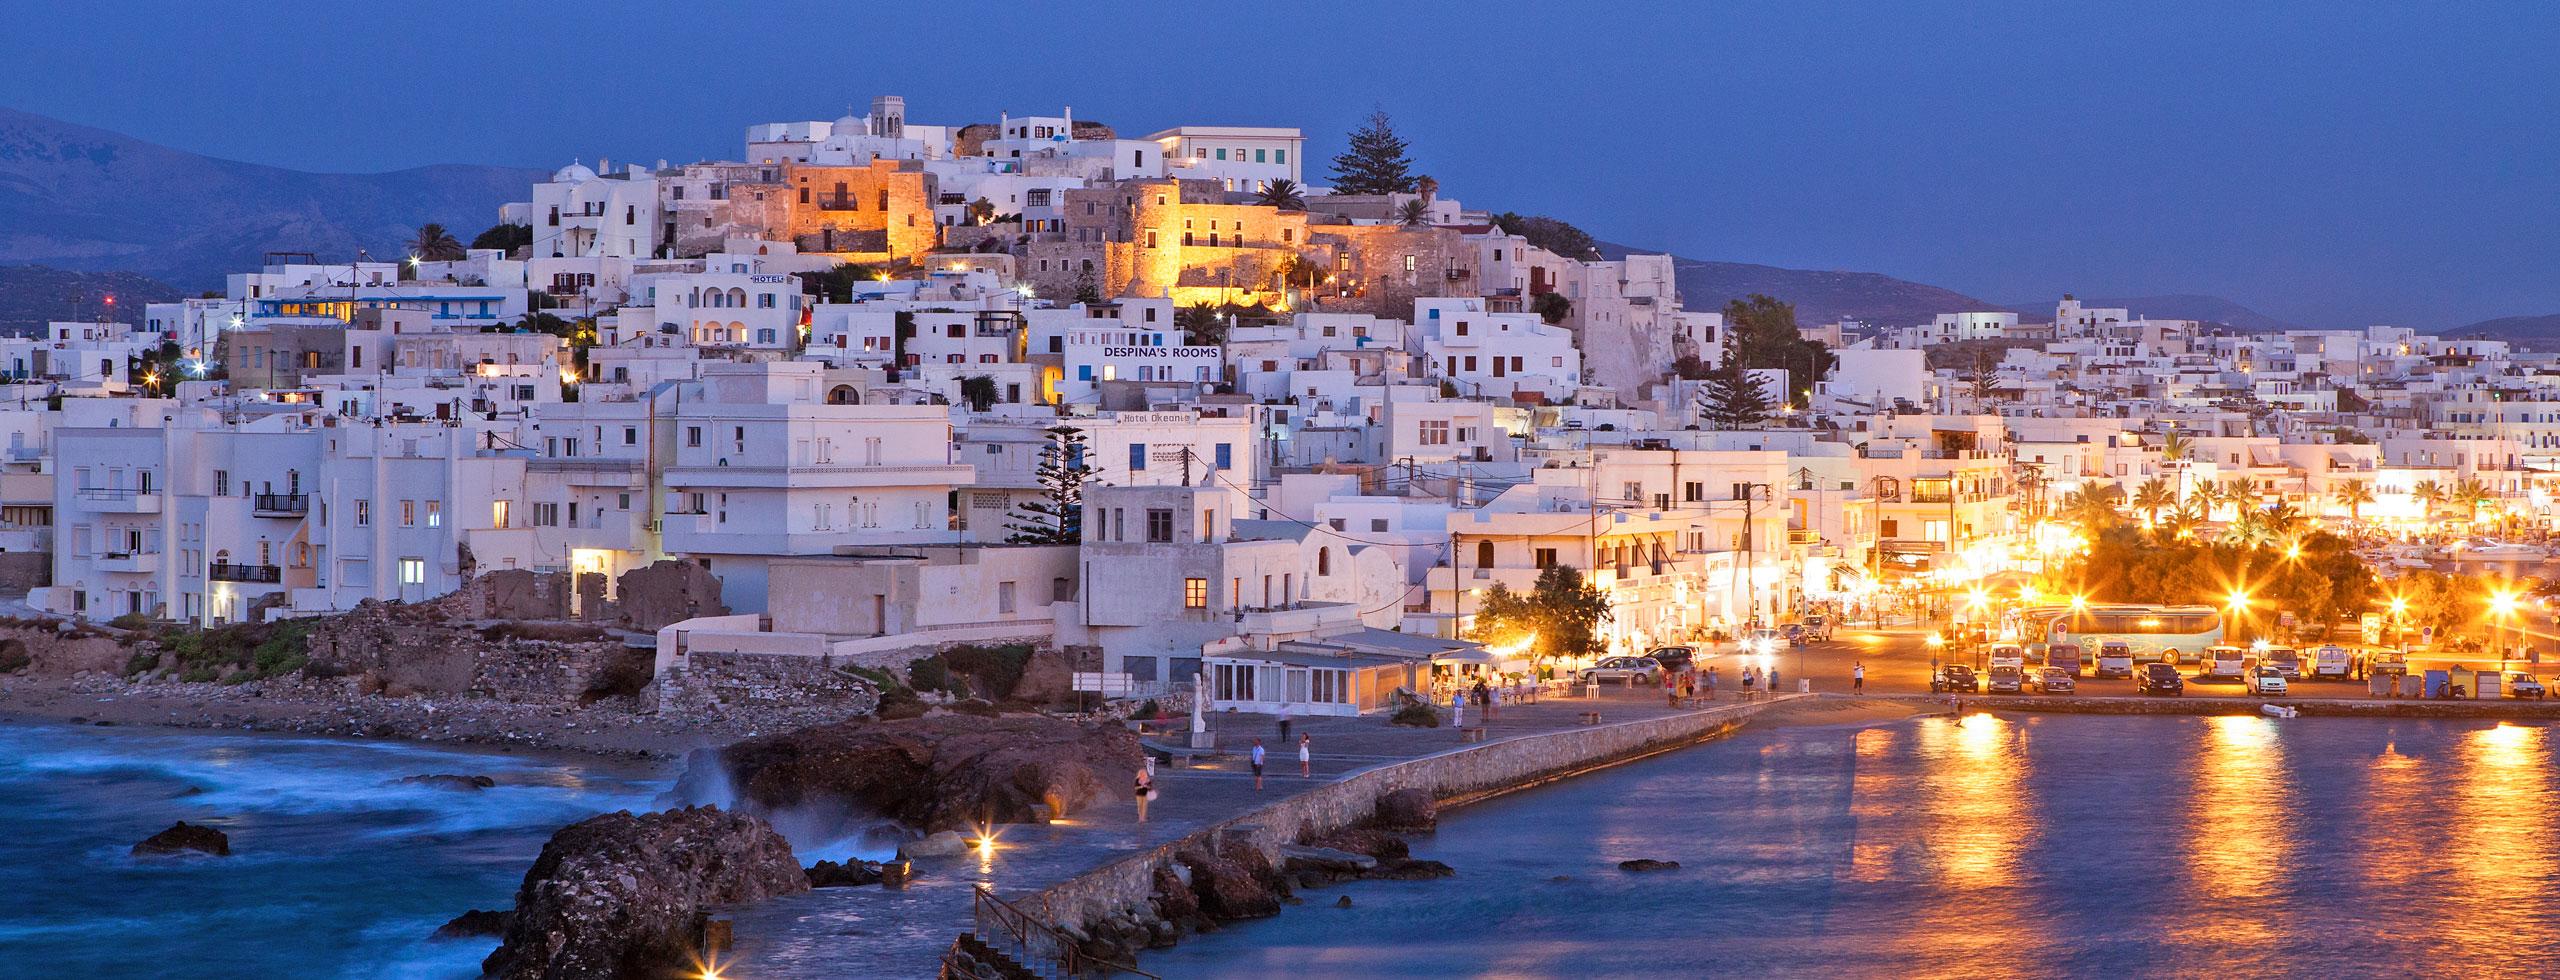 Naxos Tours Hotels Villas Archaeological Sites